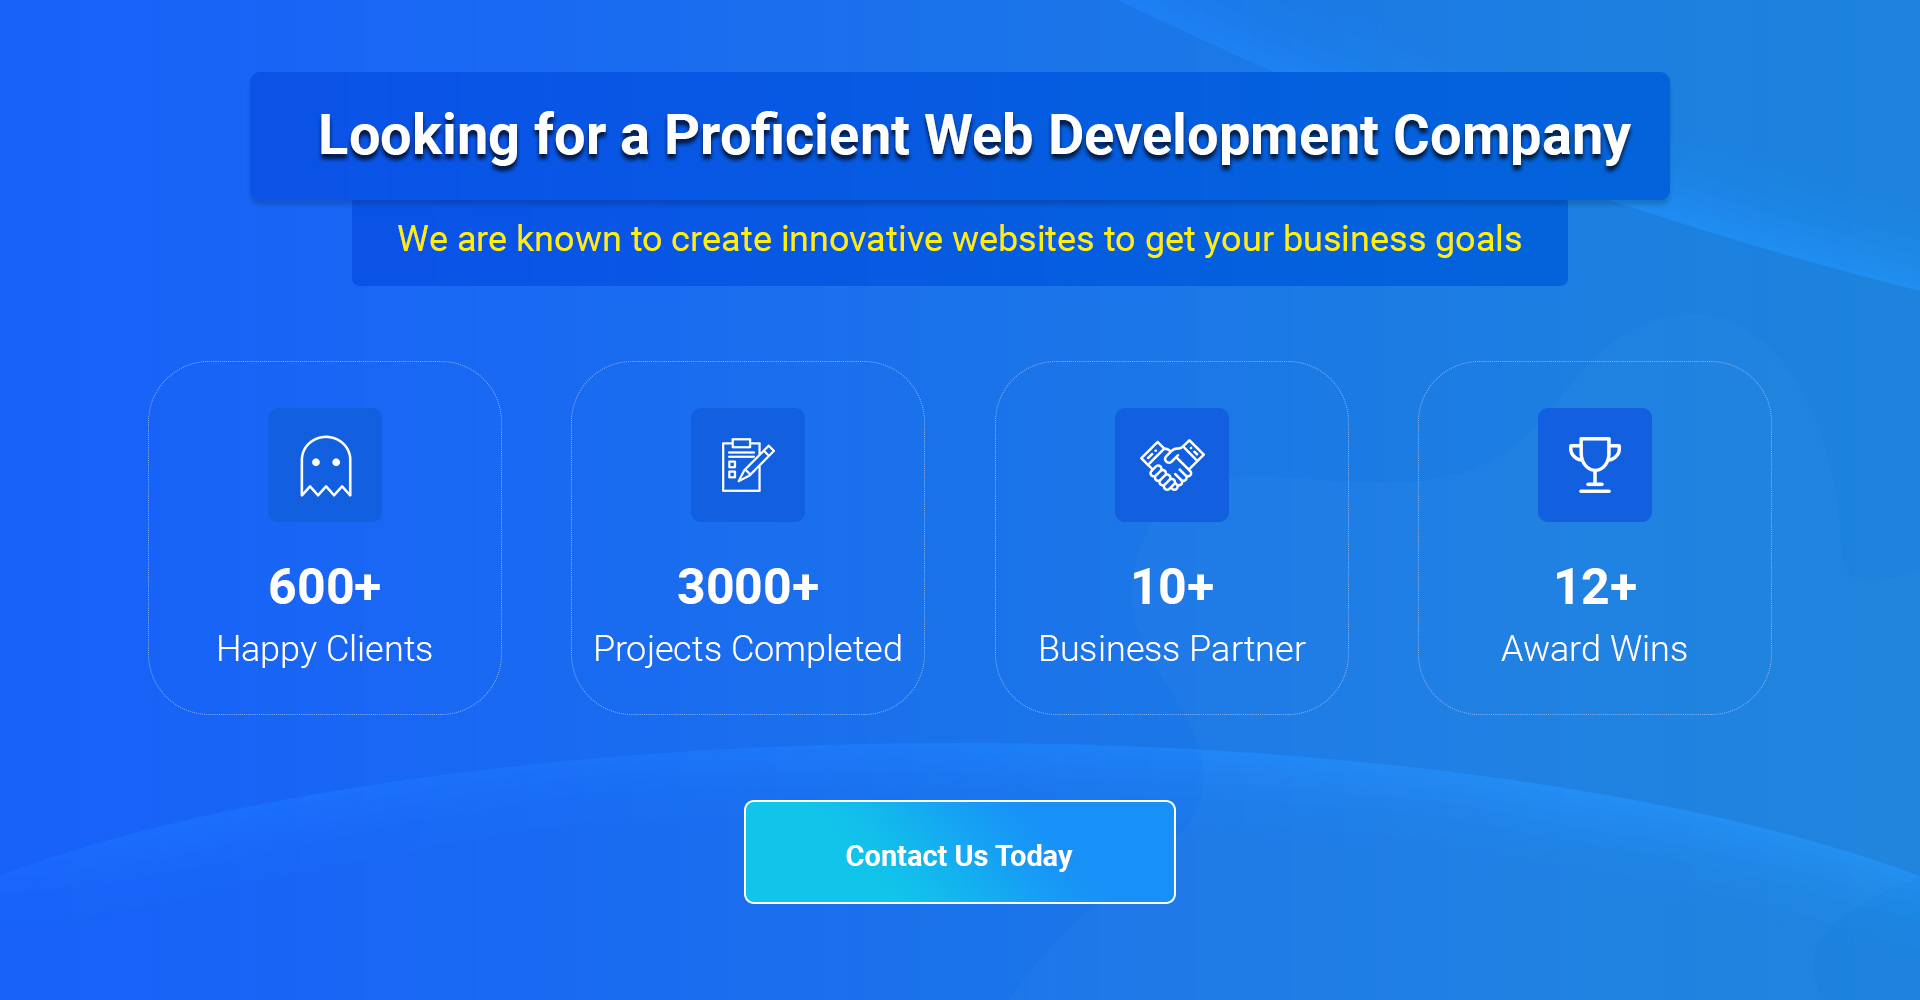 Web Development Company ad